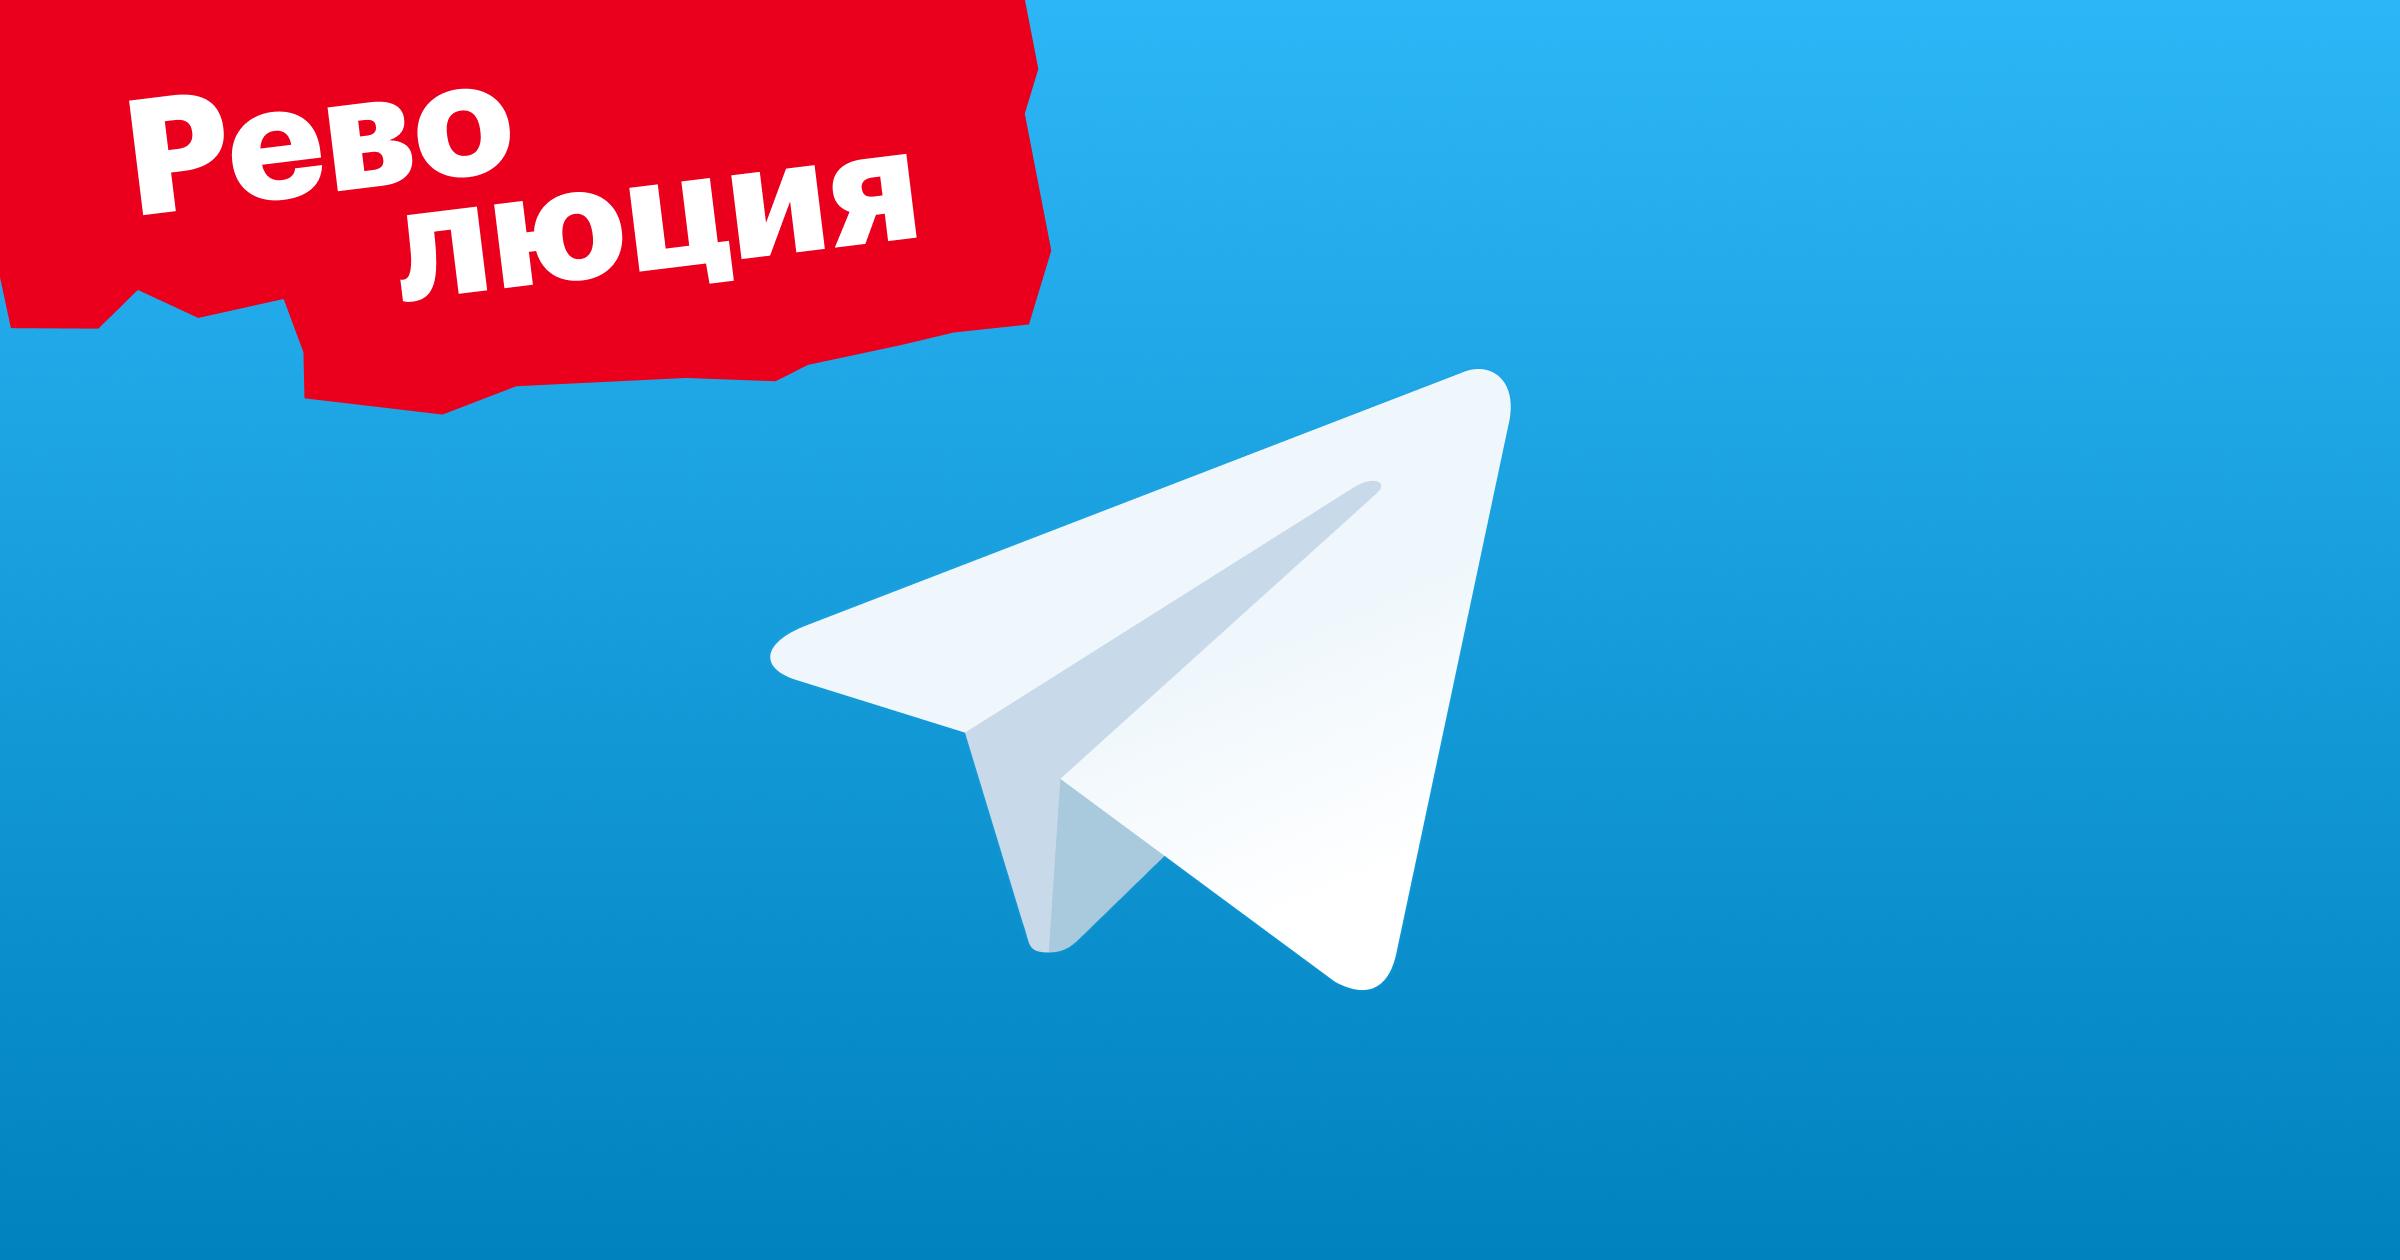 telegram, телеграм, интеграция, huntflow, хантфлоу